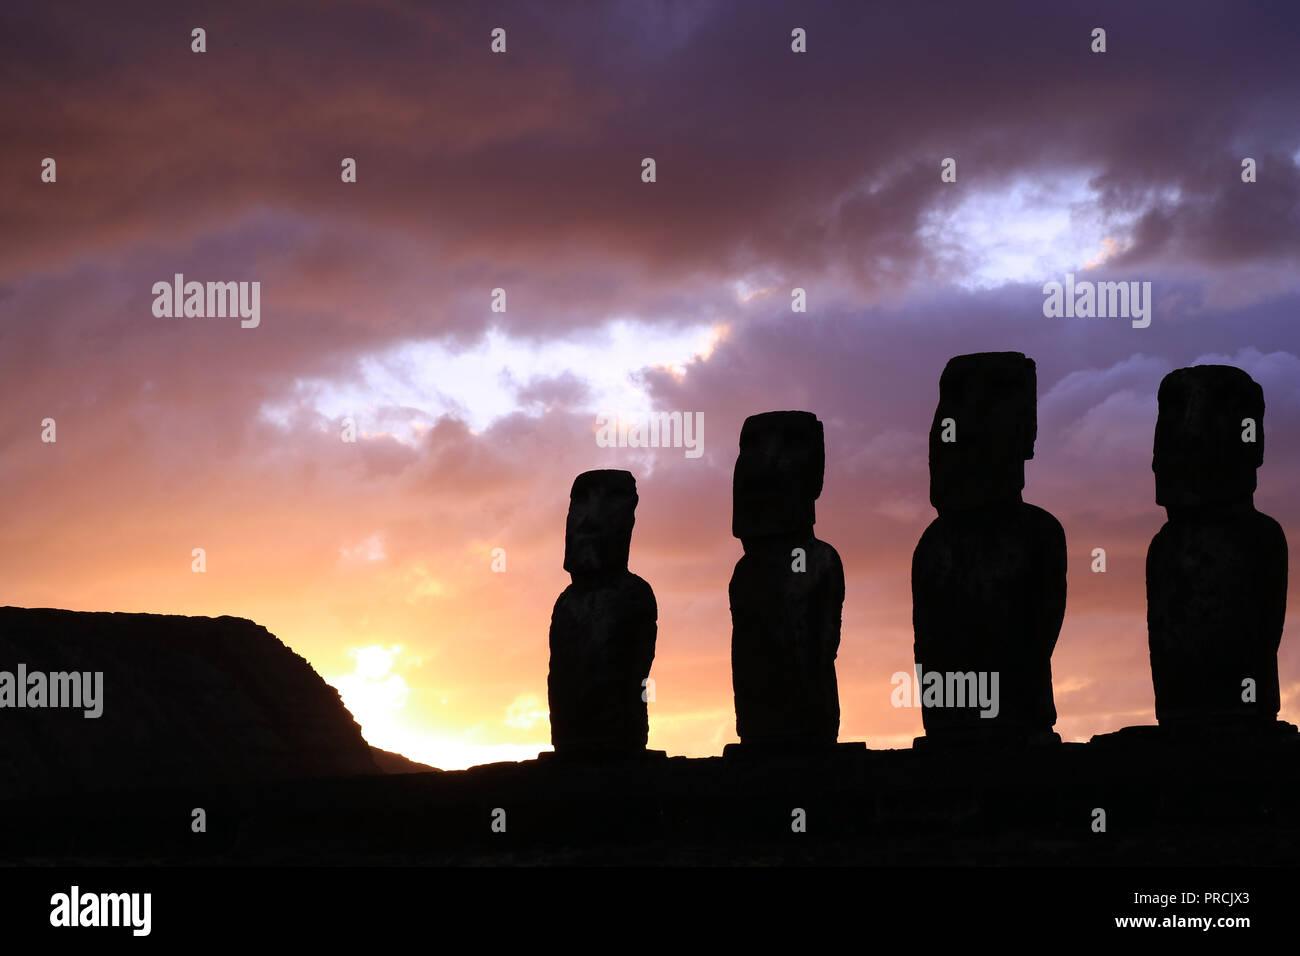 Impresionante cielo nublado Amanecer púrpura sobre la silueta de las gigantescas estatuas moai de Ahu Tongariki sitio arqueológico, Isla de Pascua, Chile Imagen De Stock